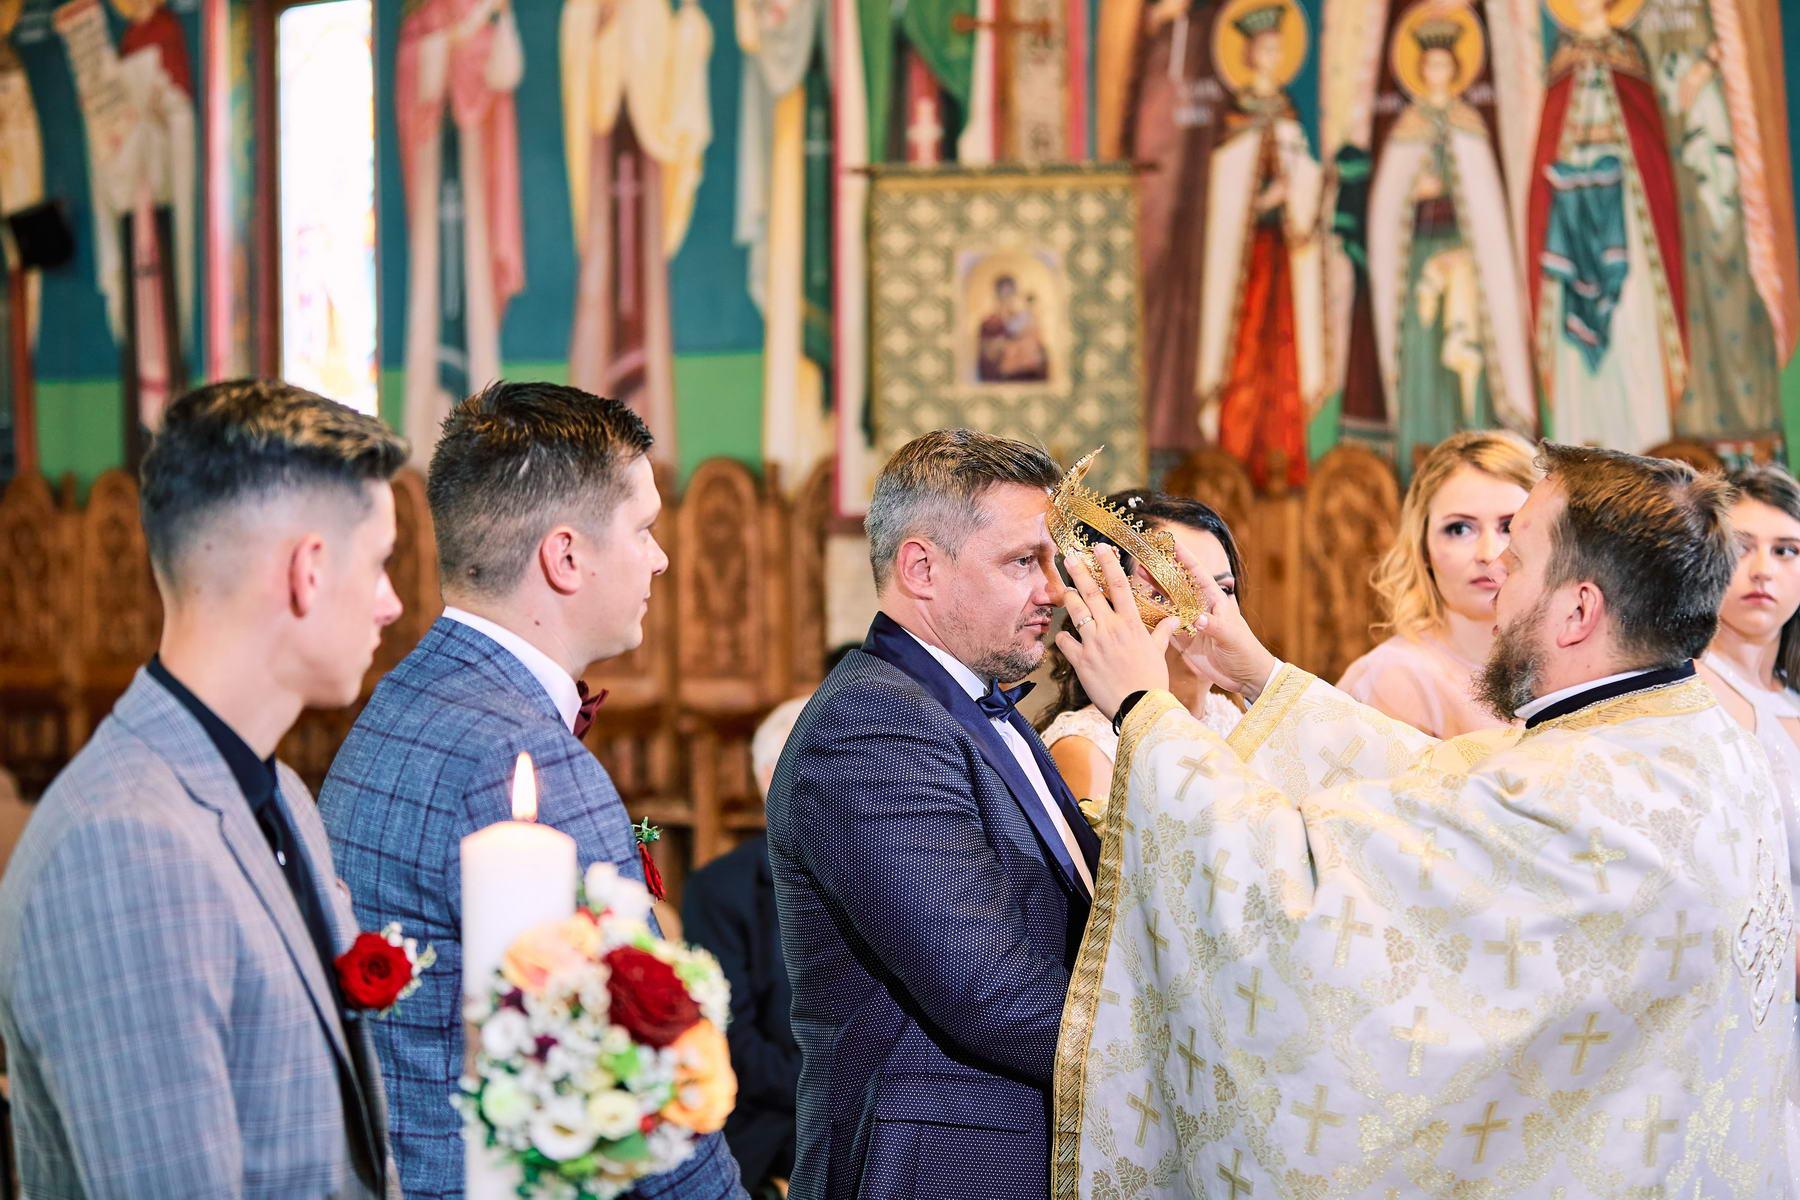 Fotografii Cununie Civila Si Religioasa Ghimbav (15)